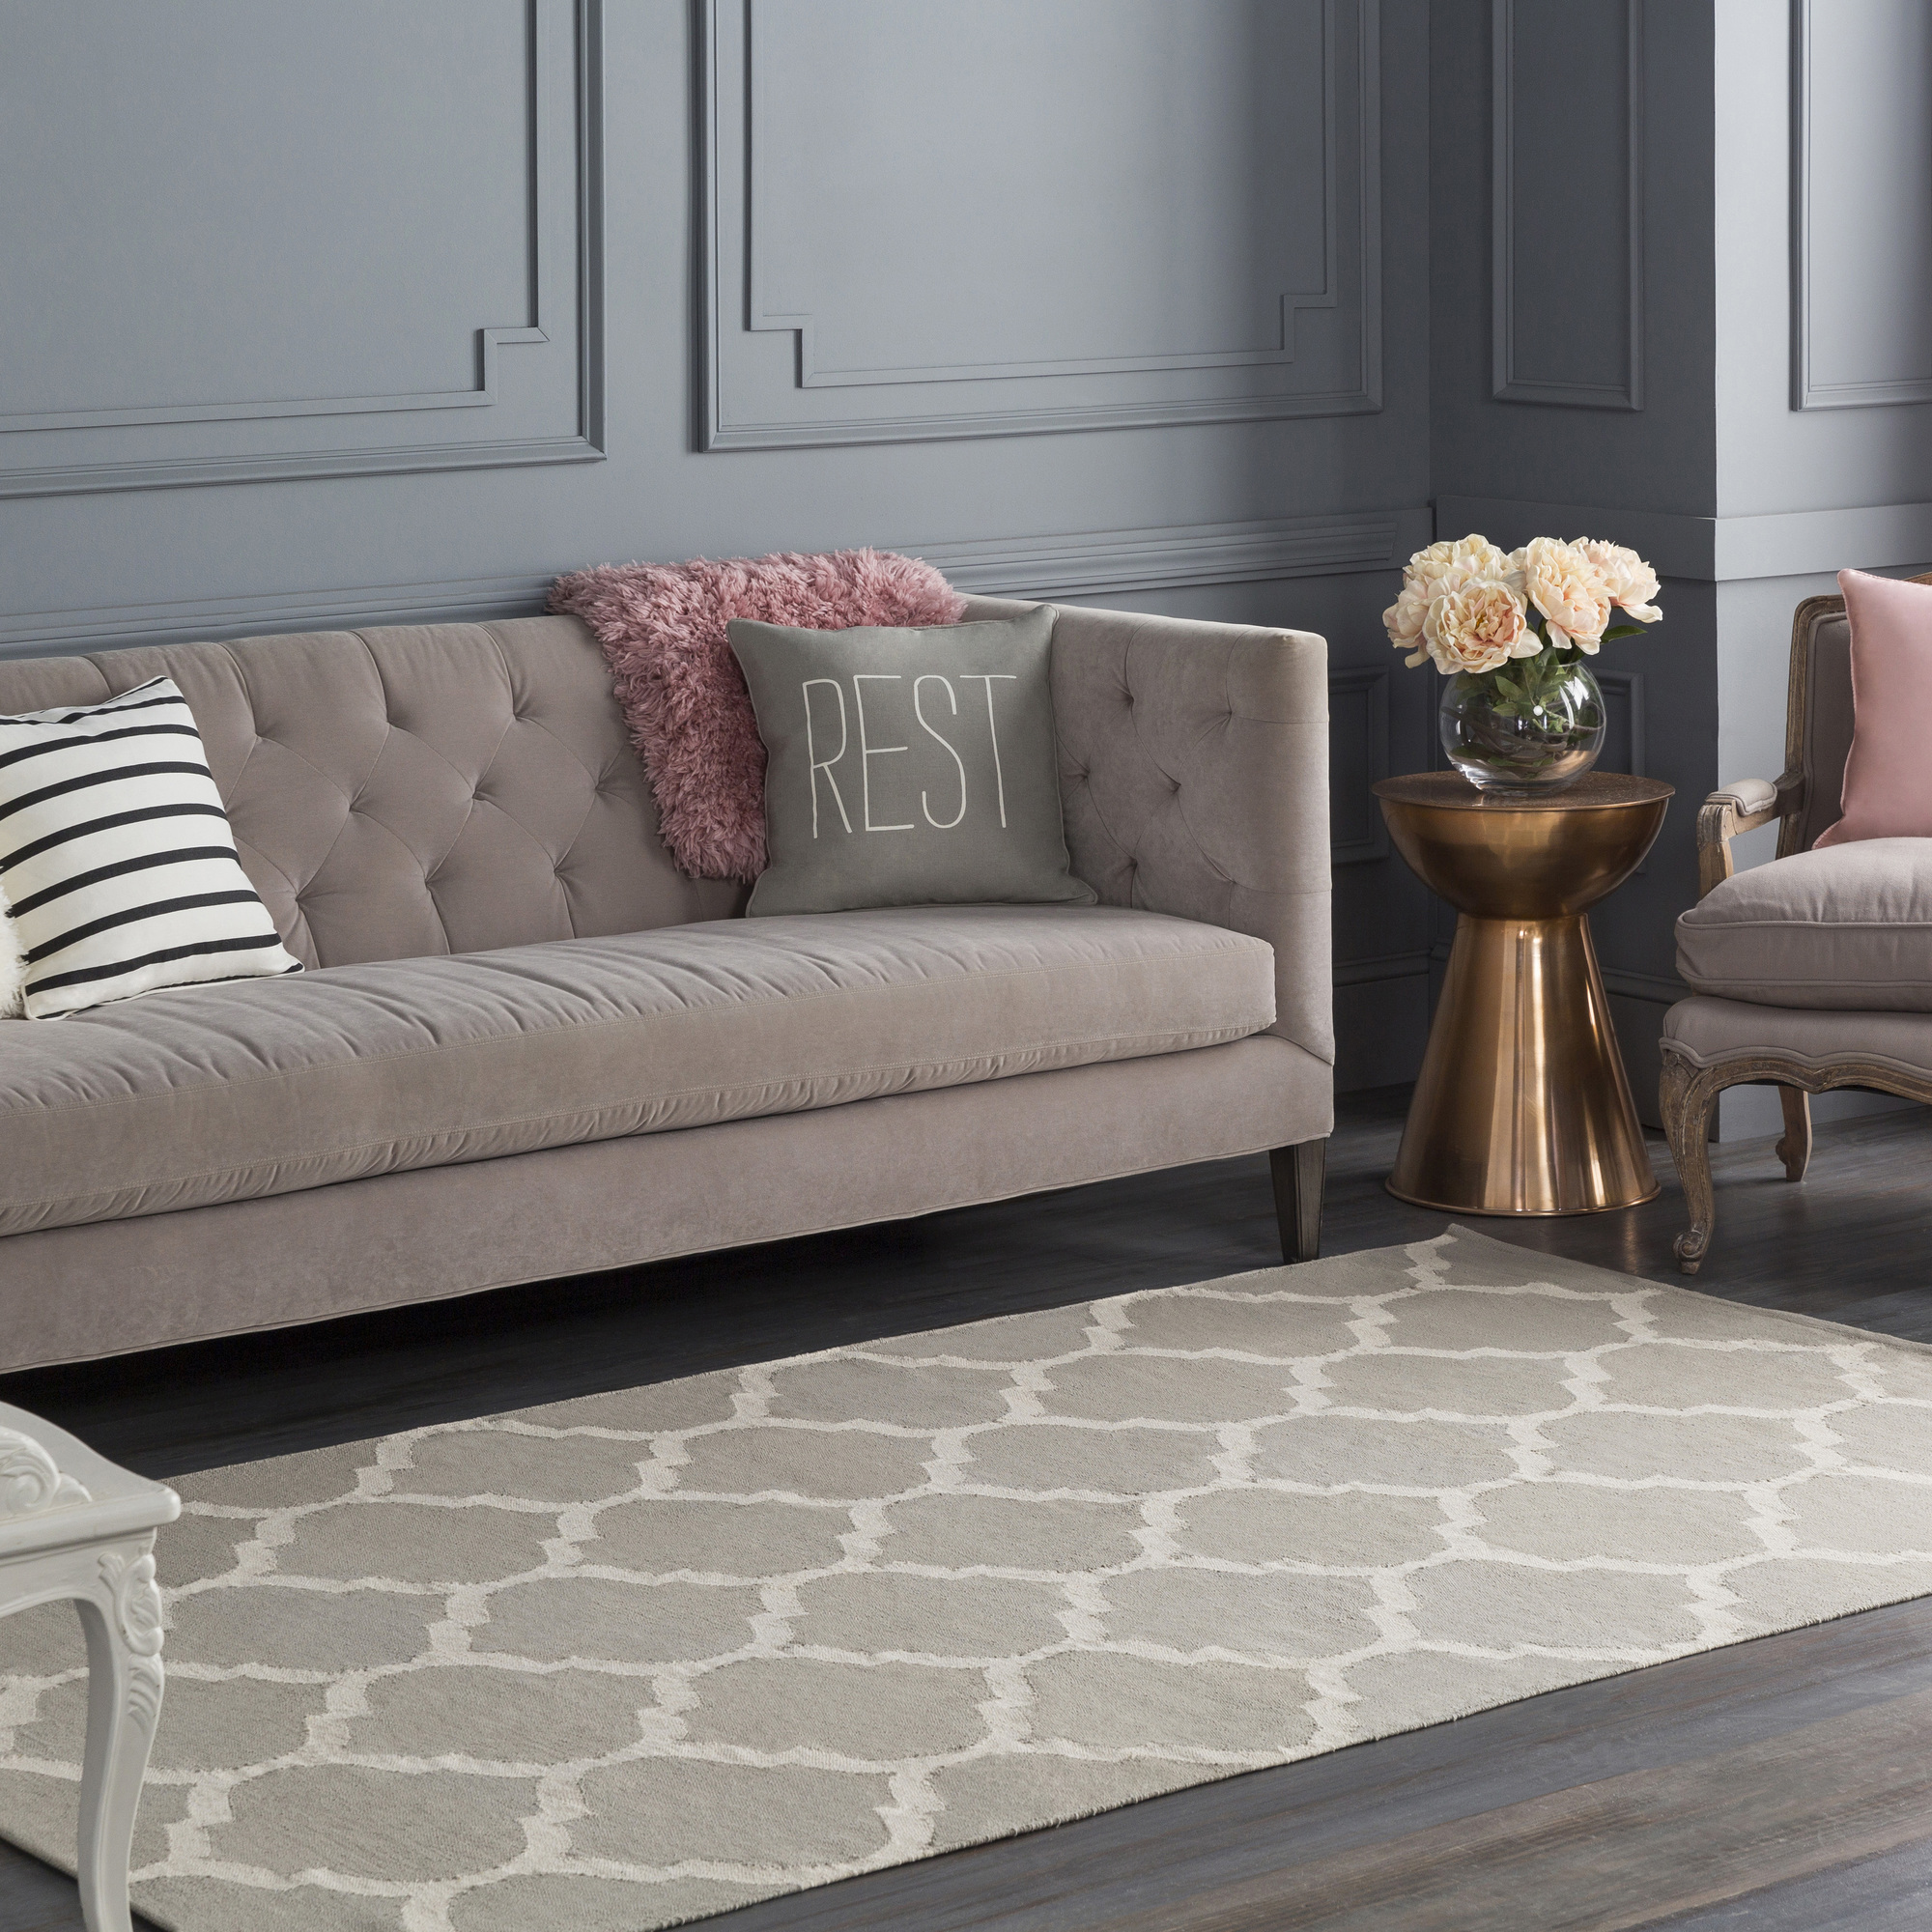 Artistic Weavers Vogue Everly 3' x 5' Rectangular Area Rug